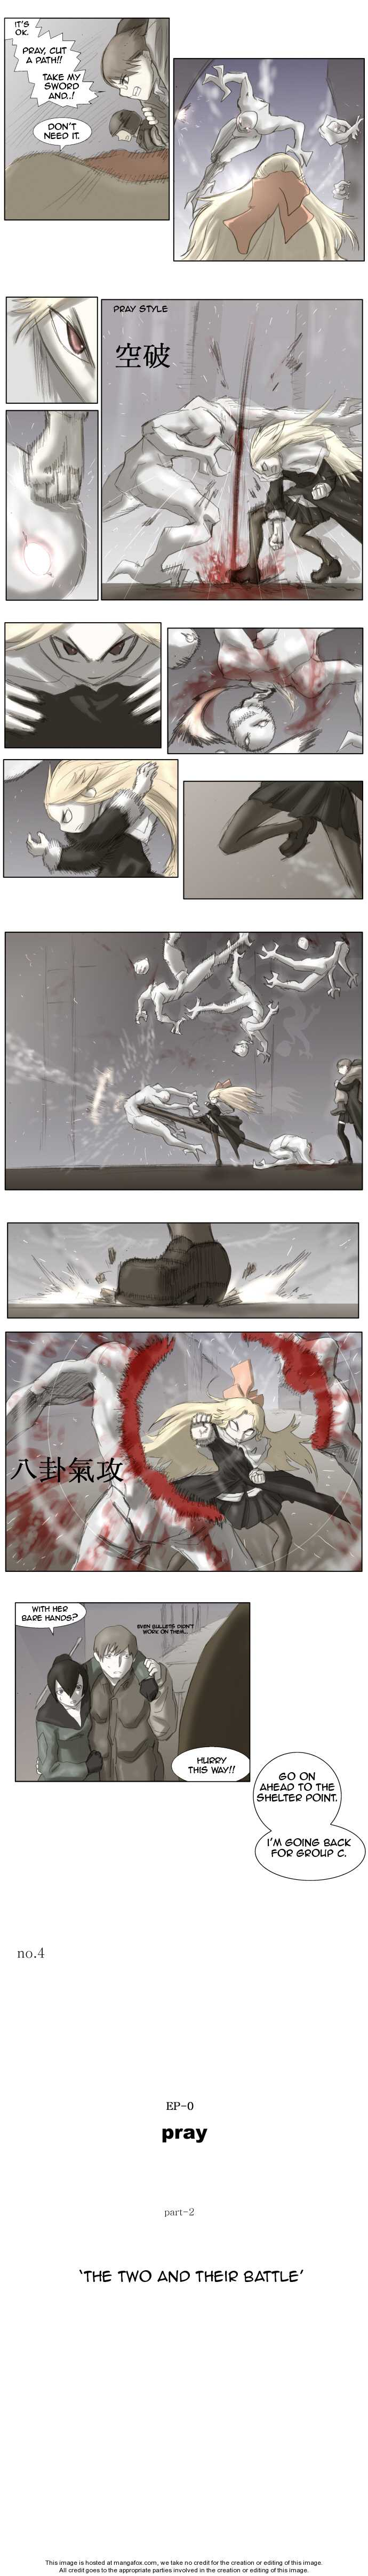 Knight Run 4 Page 2